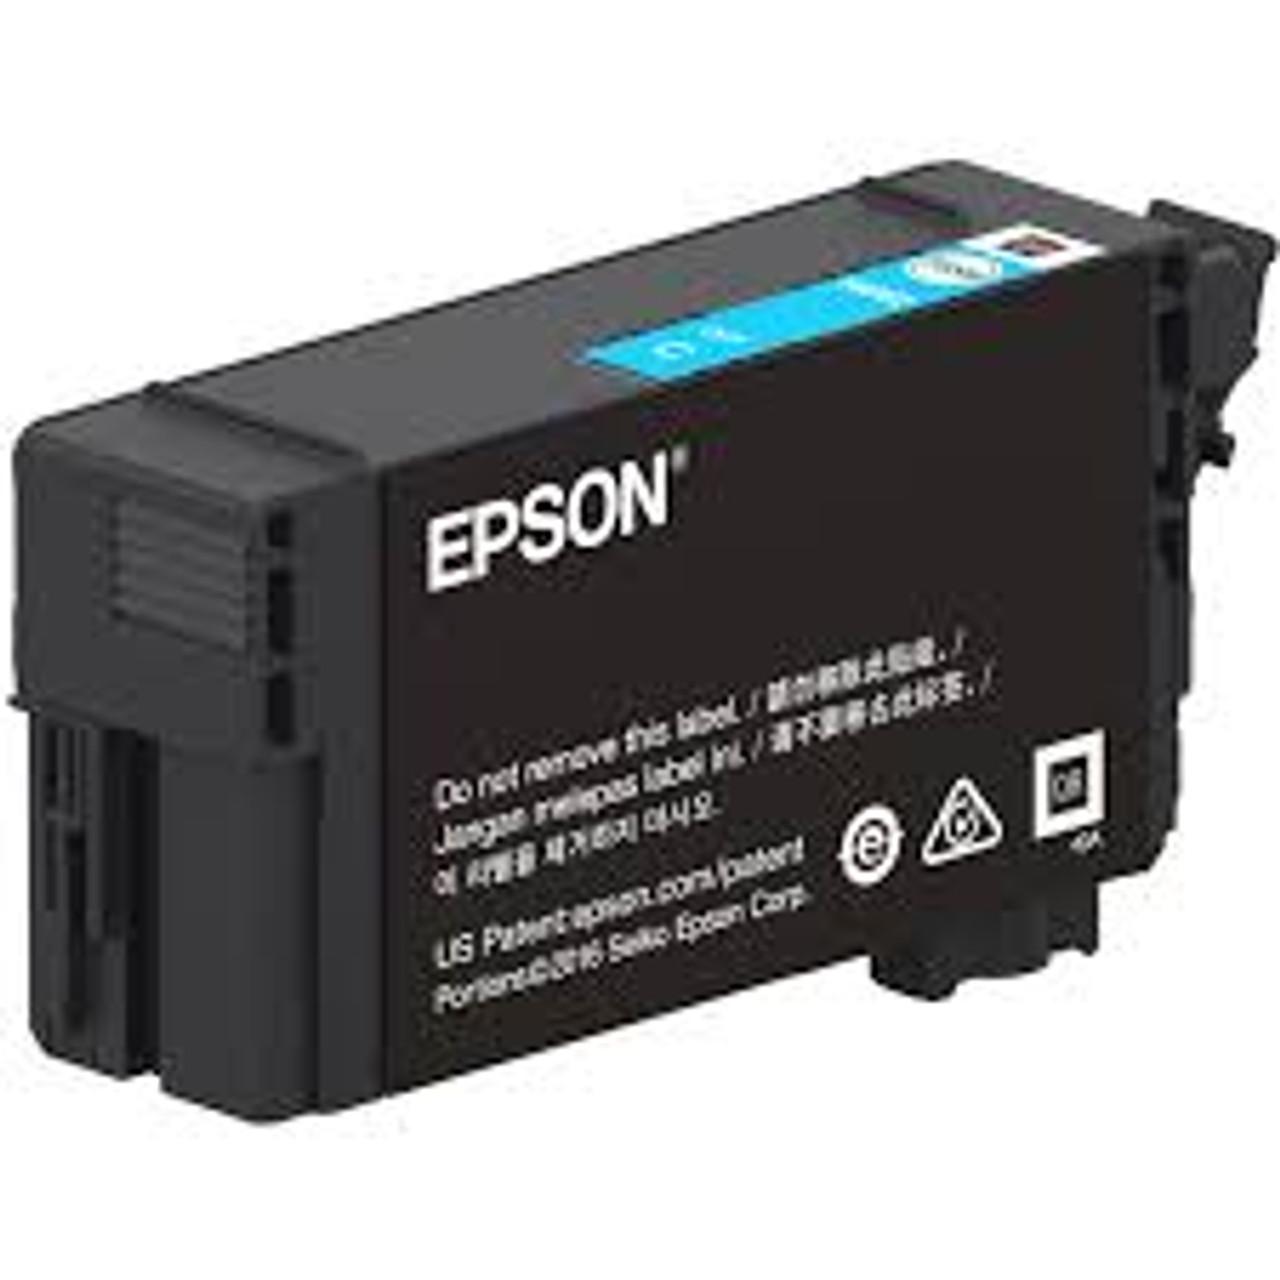 Epson UltraChrome XD2 T40W Magenta High-Capacity Ink Cartridge 50ml